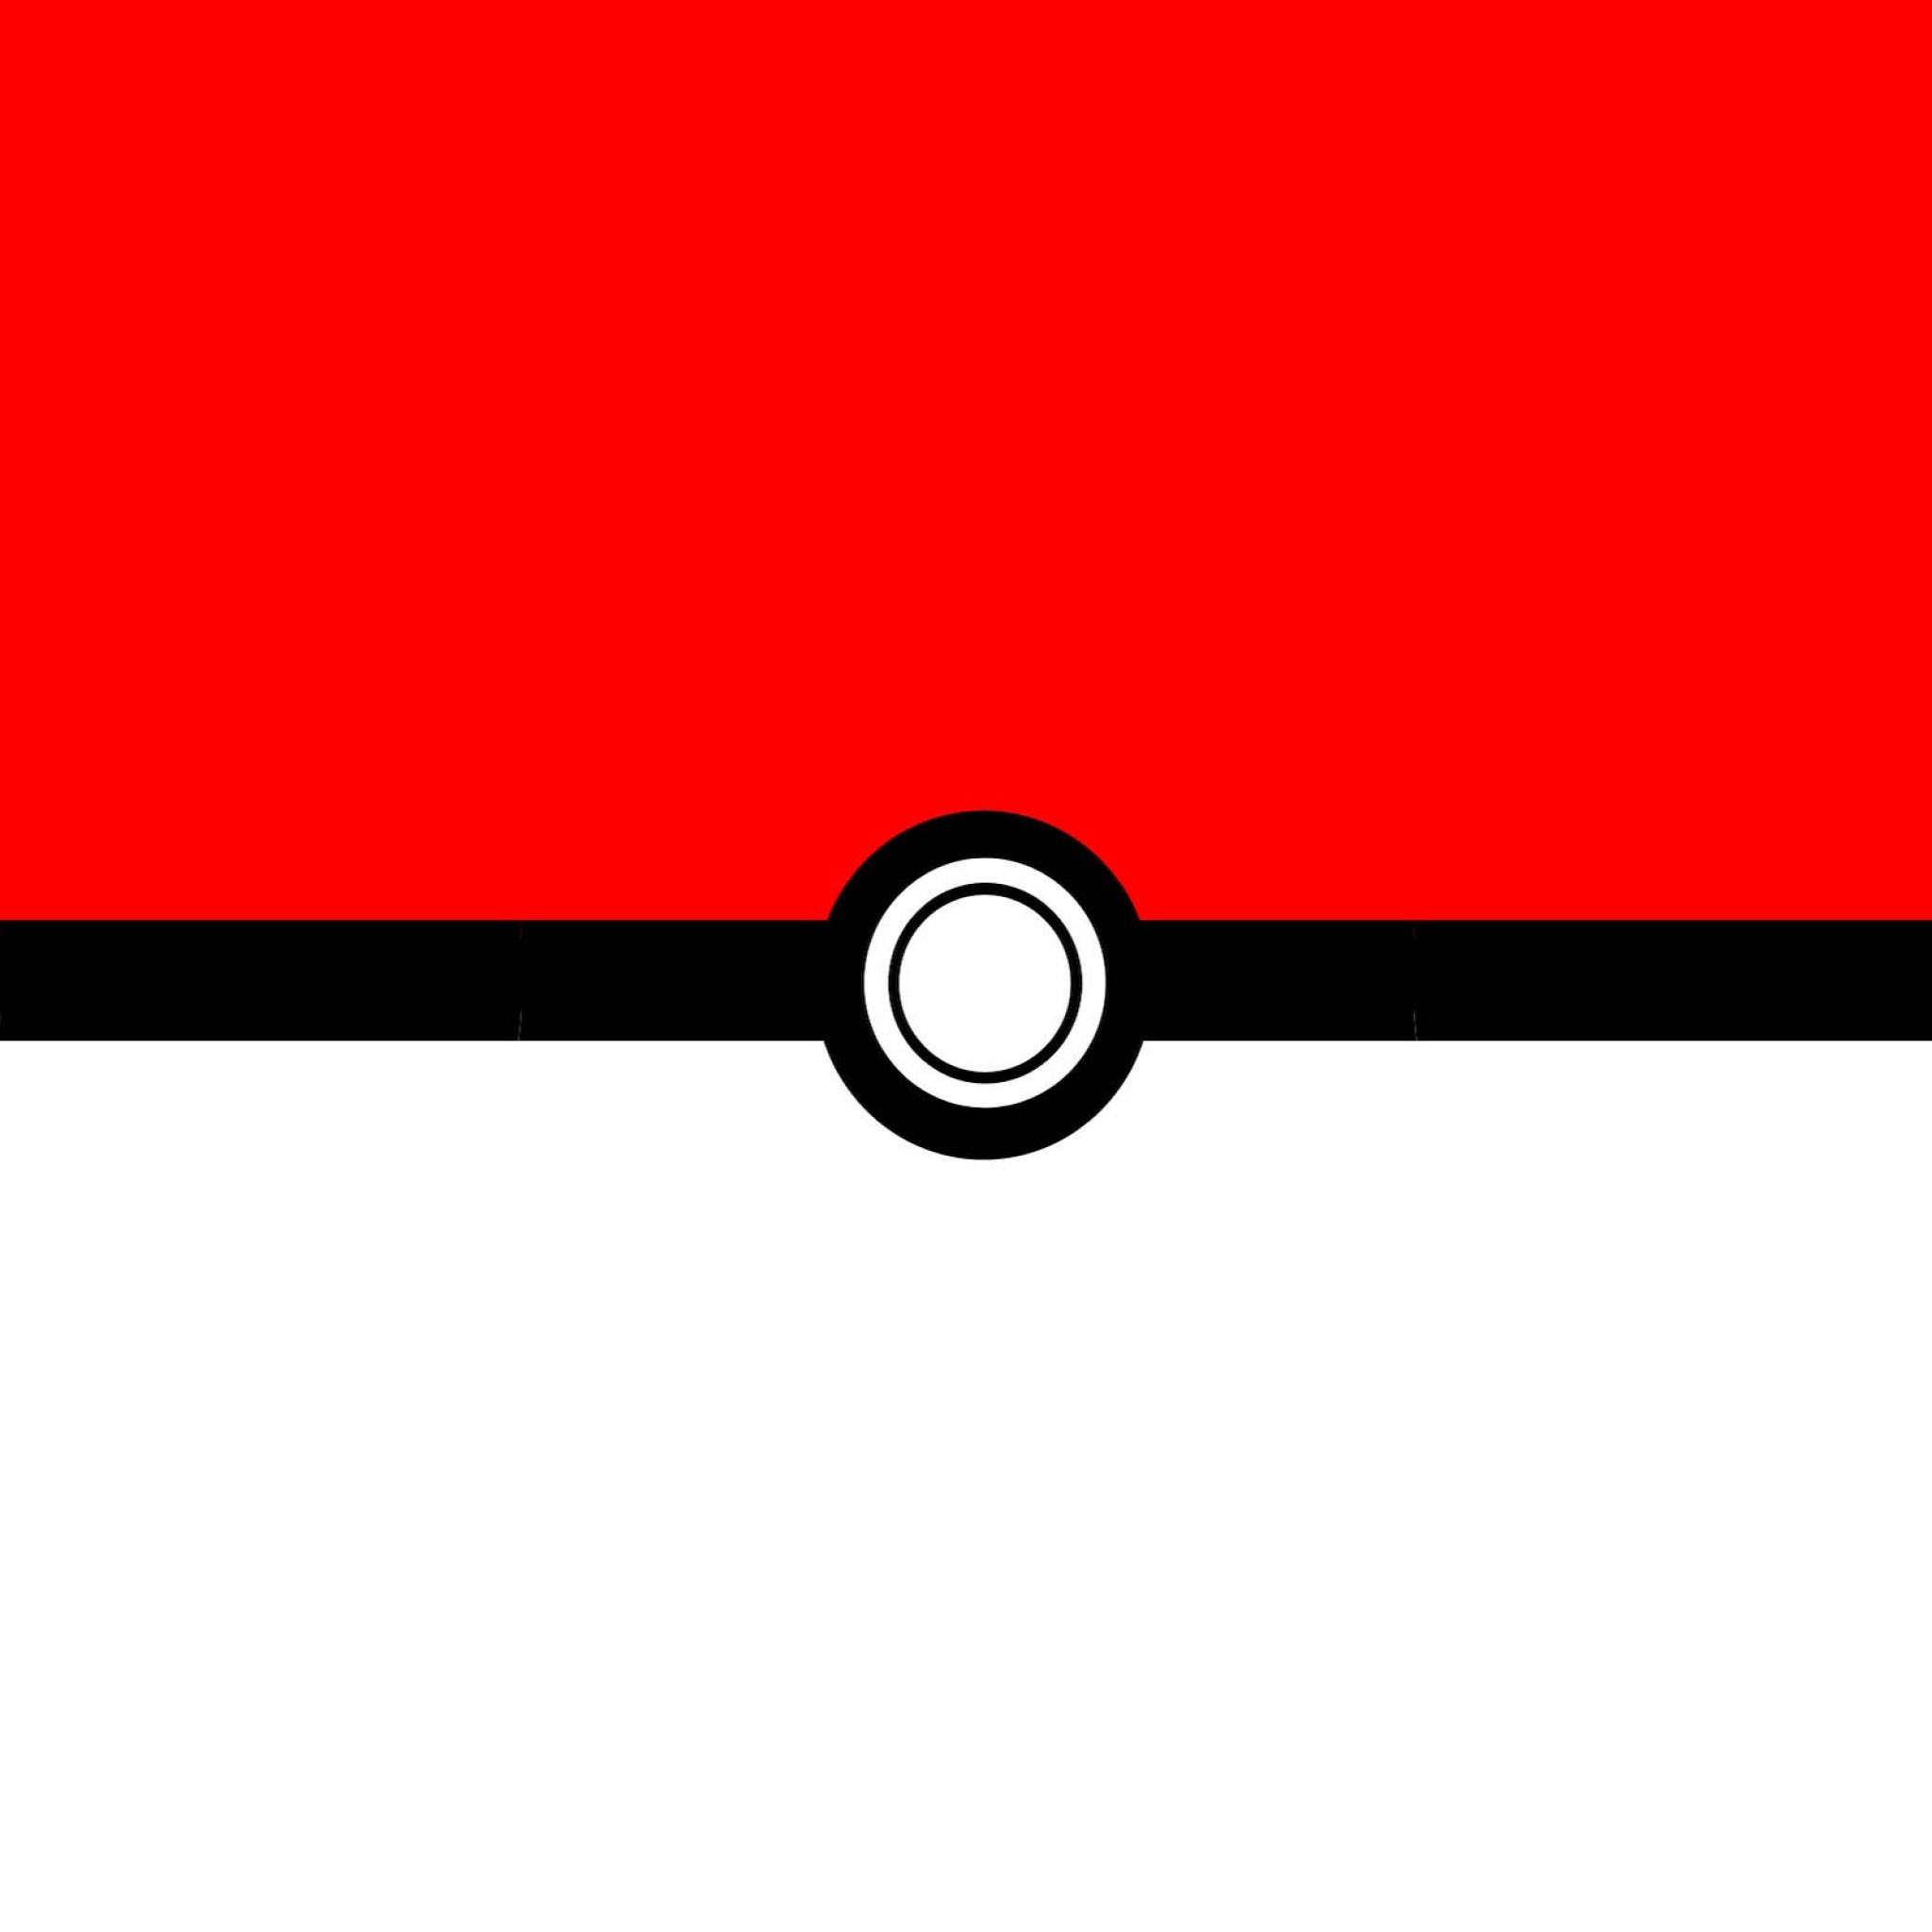 2048x2048px Pokemon Iphone Wallpaper HD Background   DigntaswppCom 2048x2048